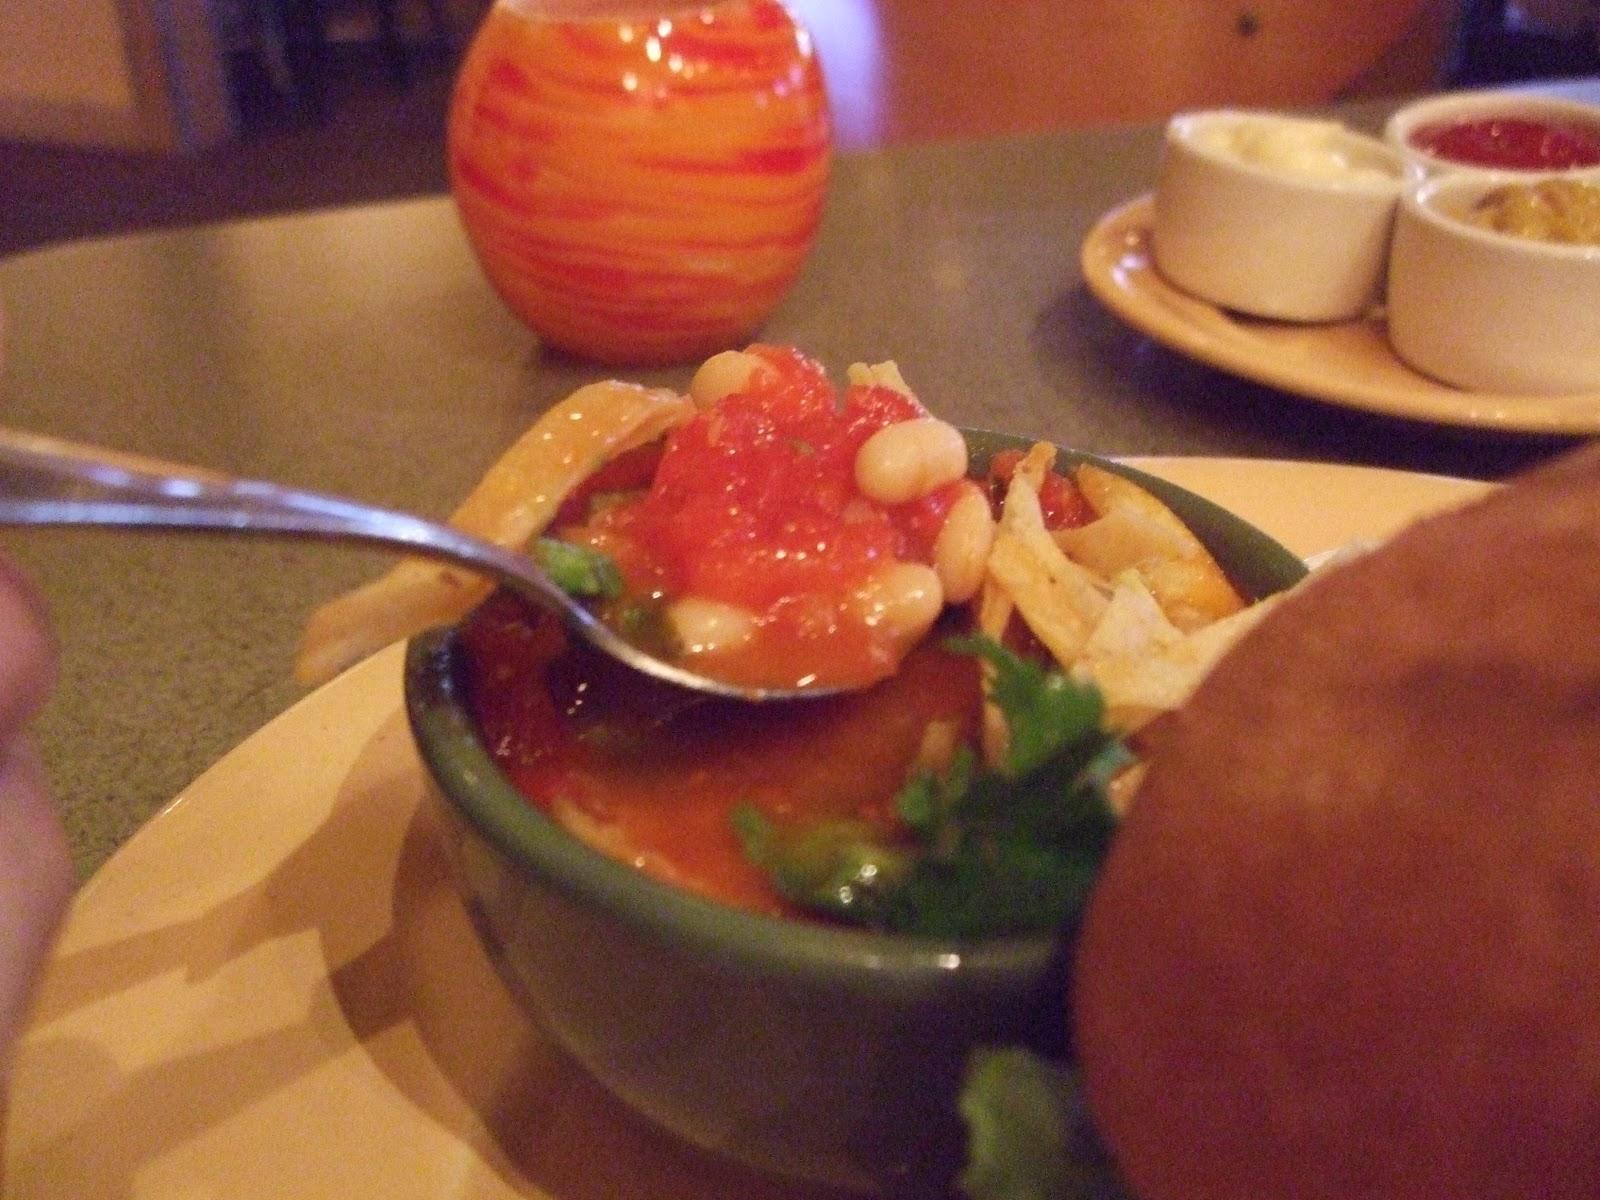 Gluten Free In Slc Spin Cafe In Heber Utah Gluten Free